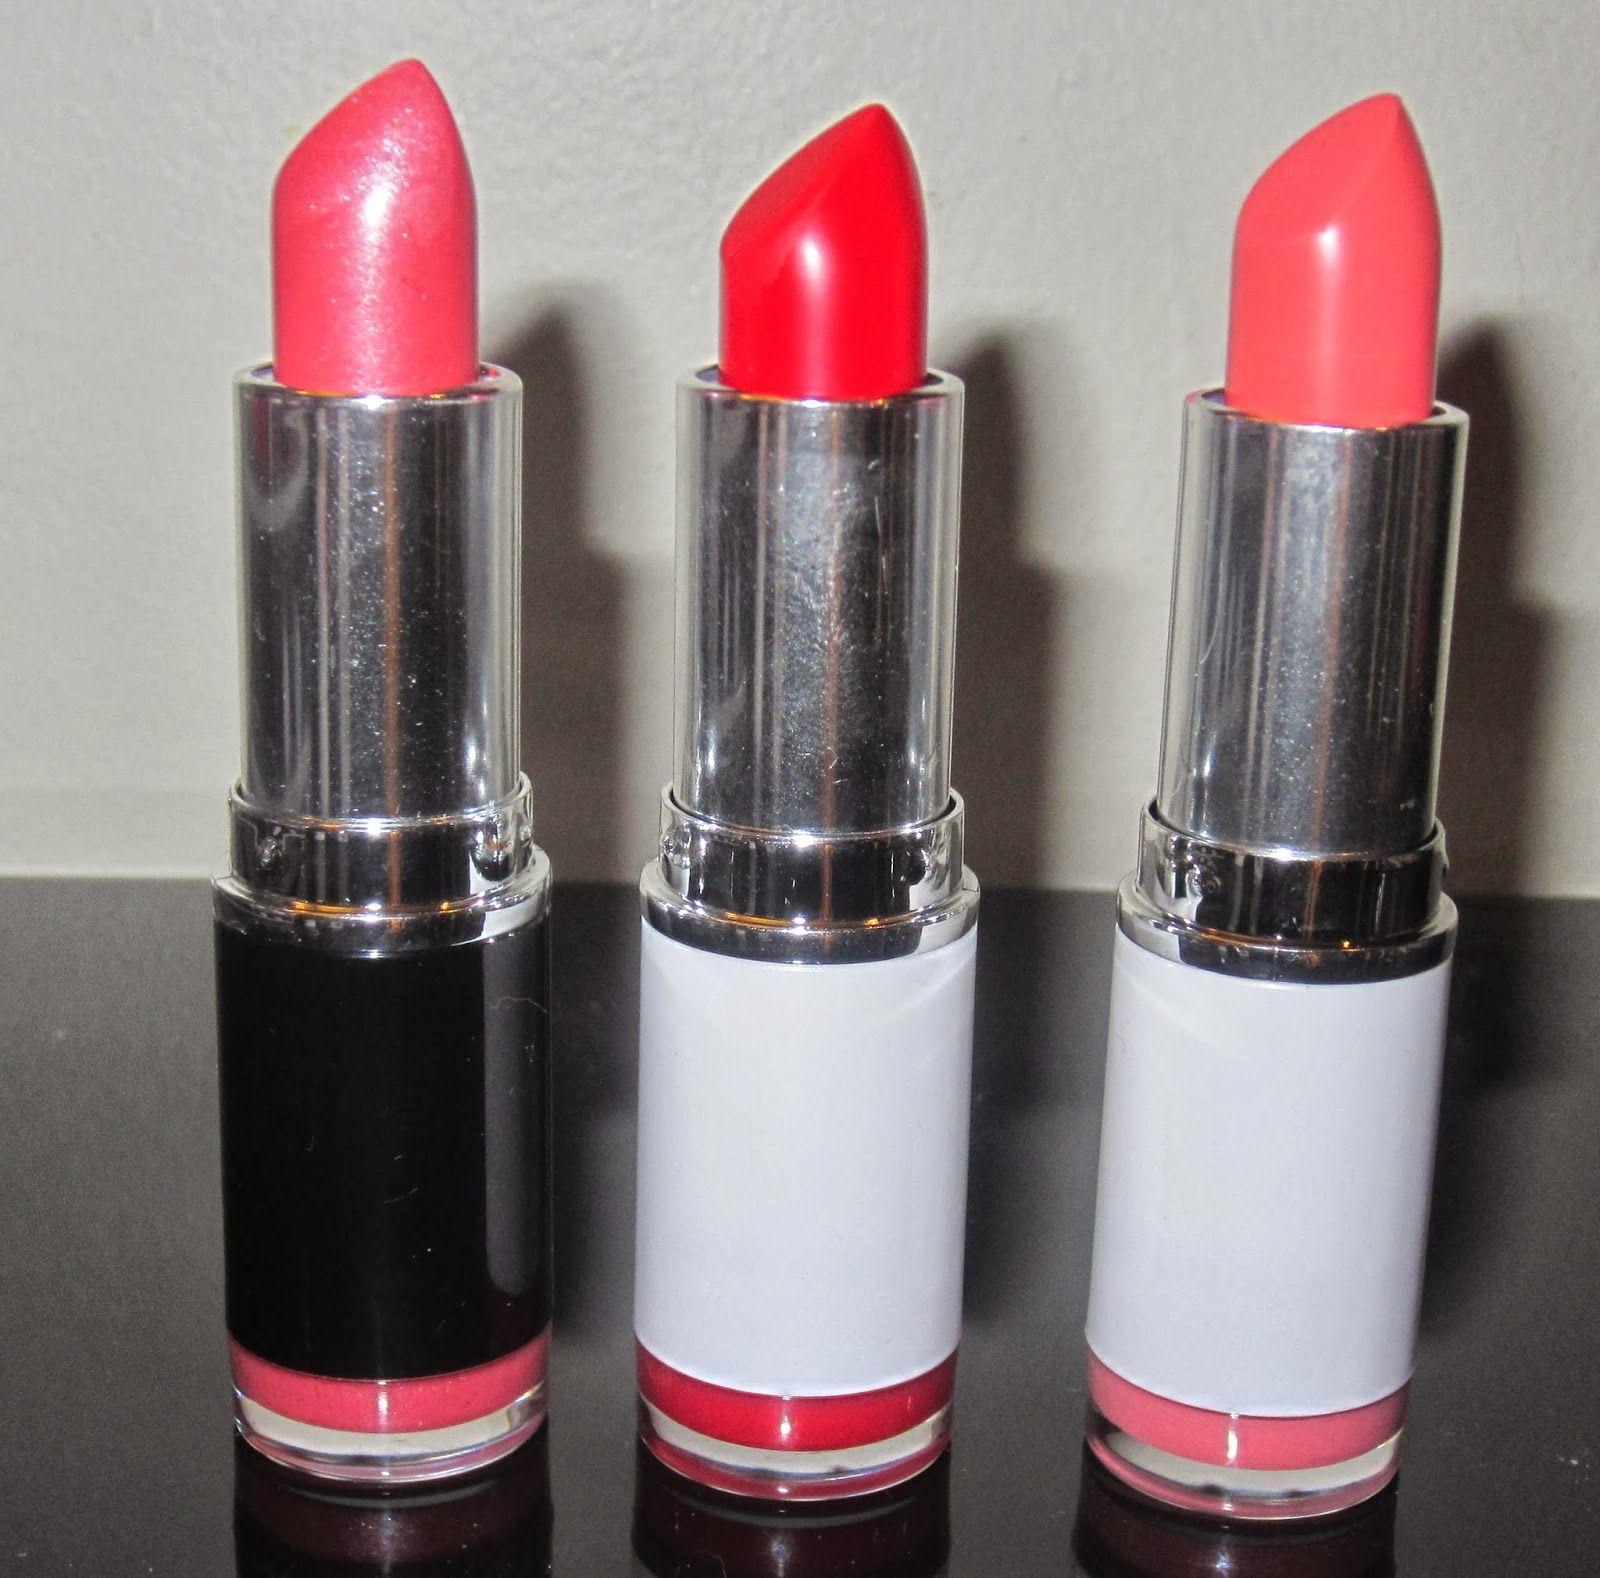 Make Up Academy Lipstick Shade10 Lipstick, Makeup